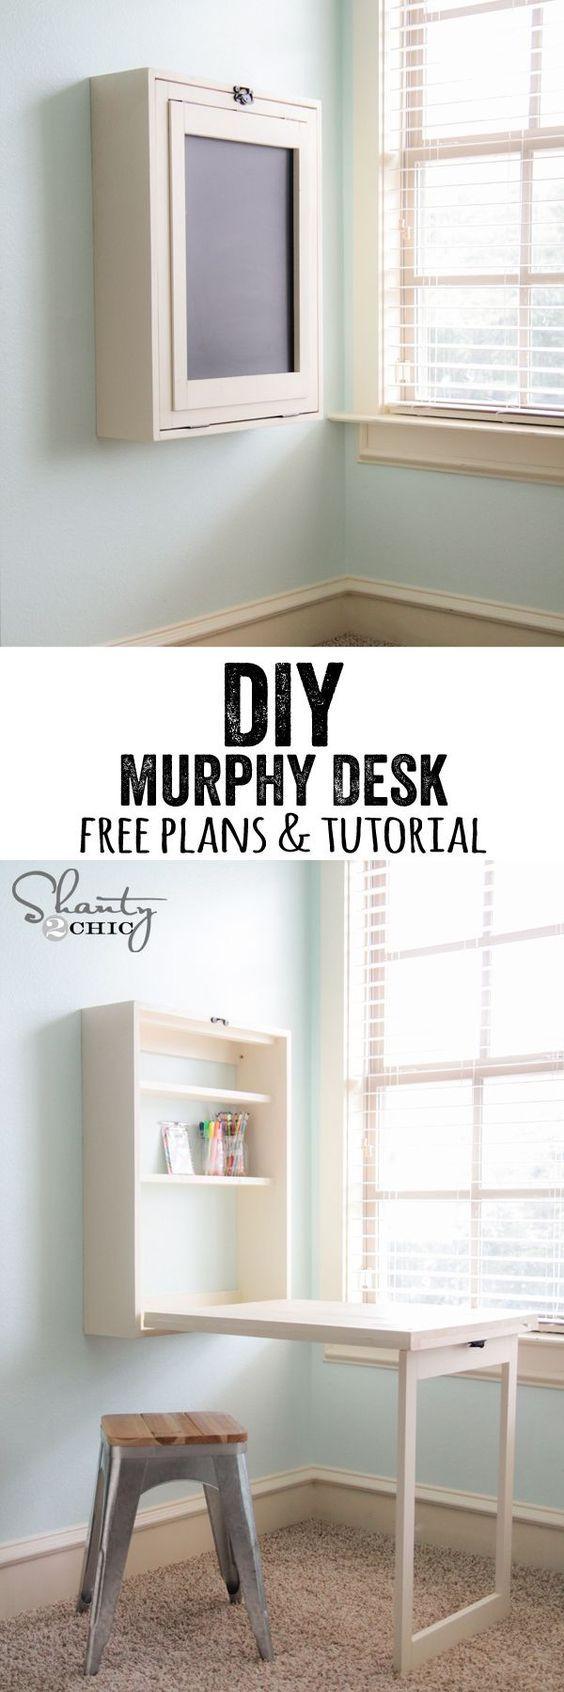 Best 25 industrial murphy beds ideas on pinterest industrial diy murphy desk amipublicfo Image collections